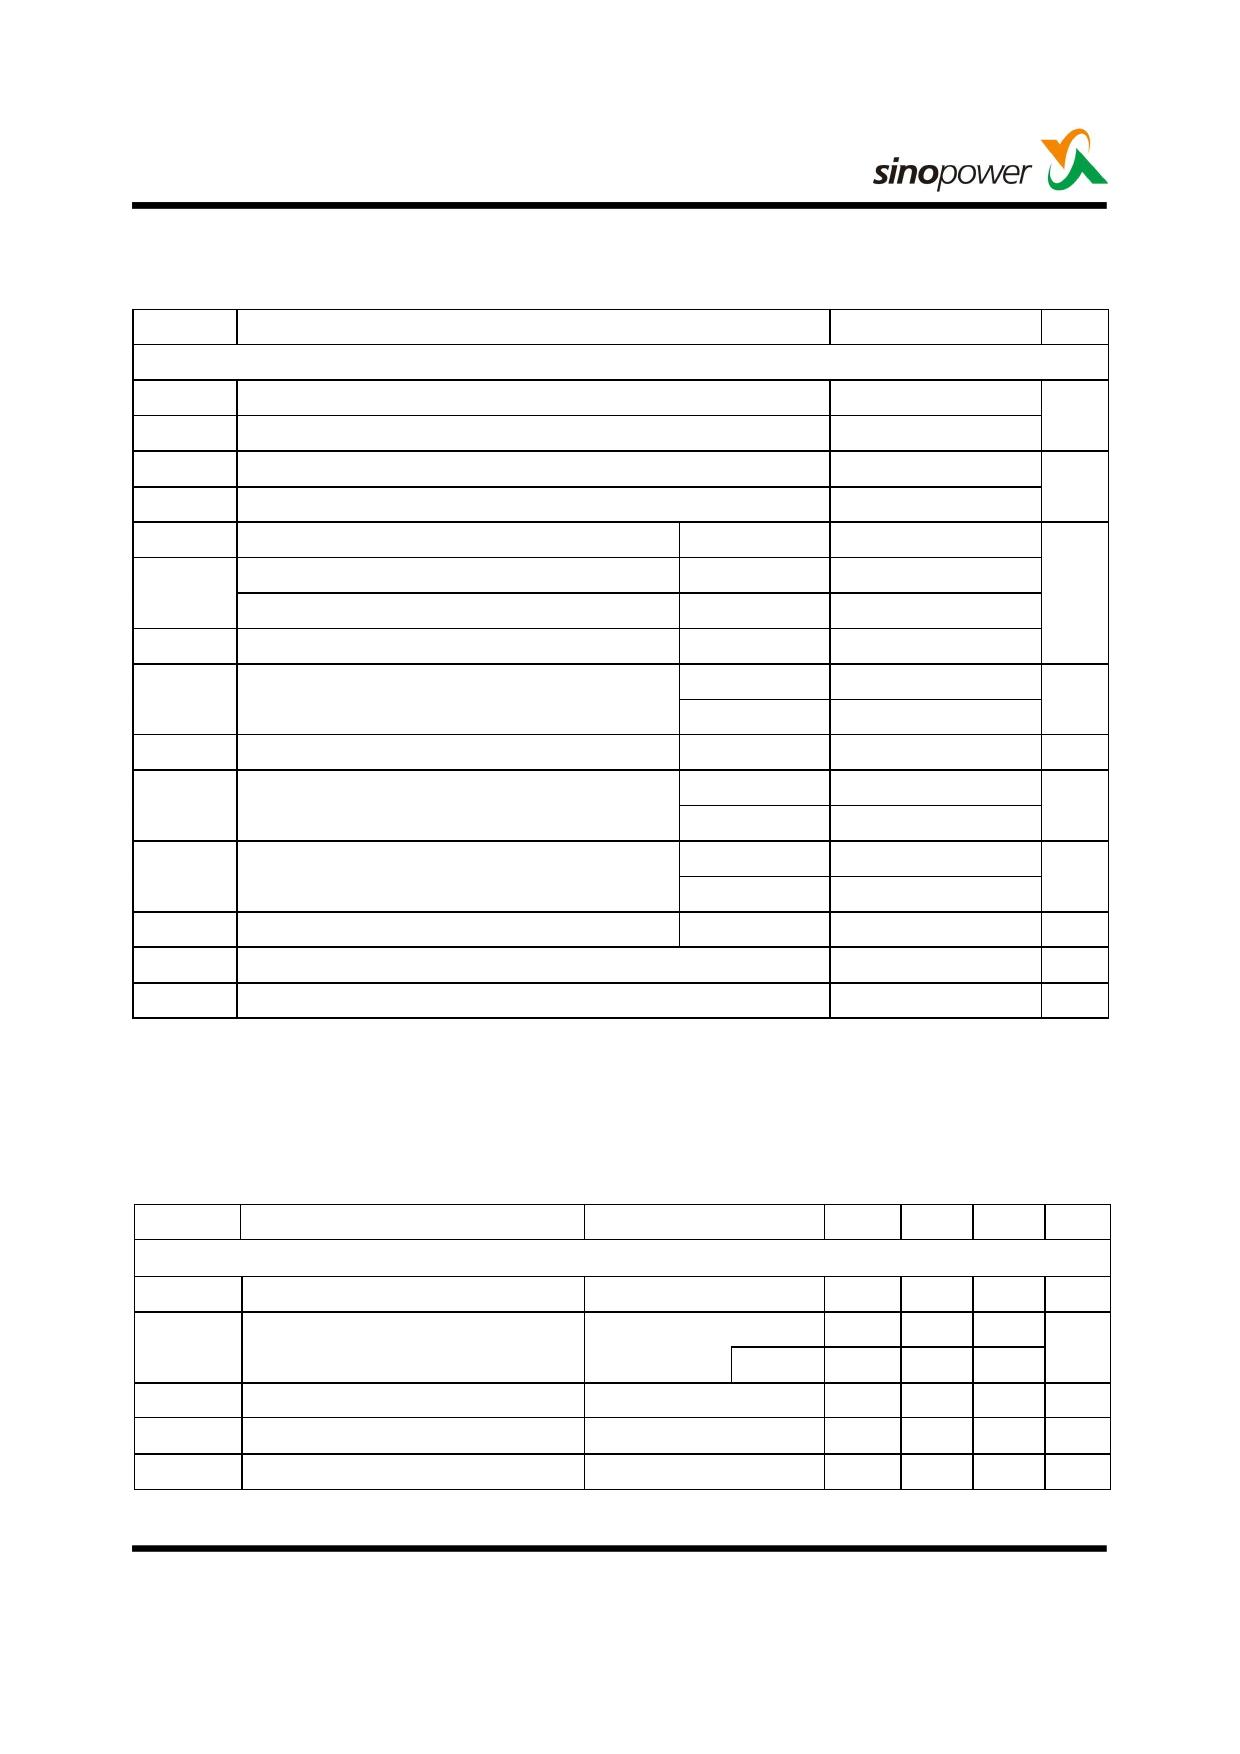 SM7507NSF pdf, equivalent, schematic